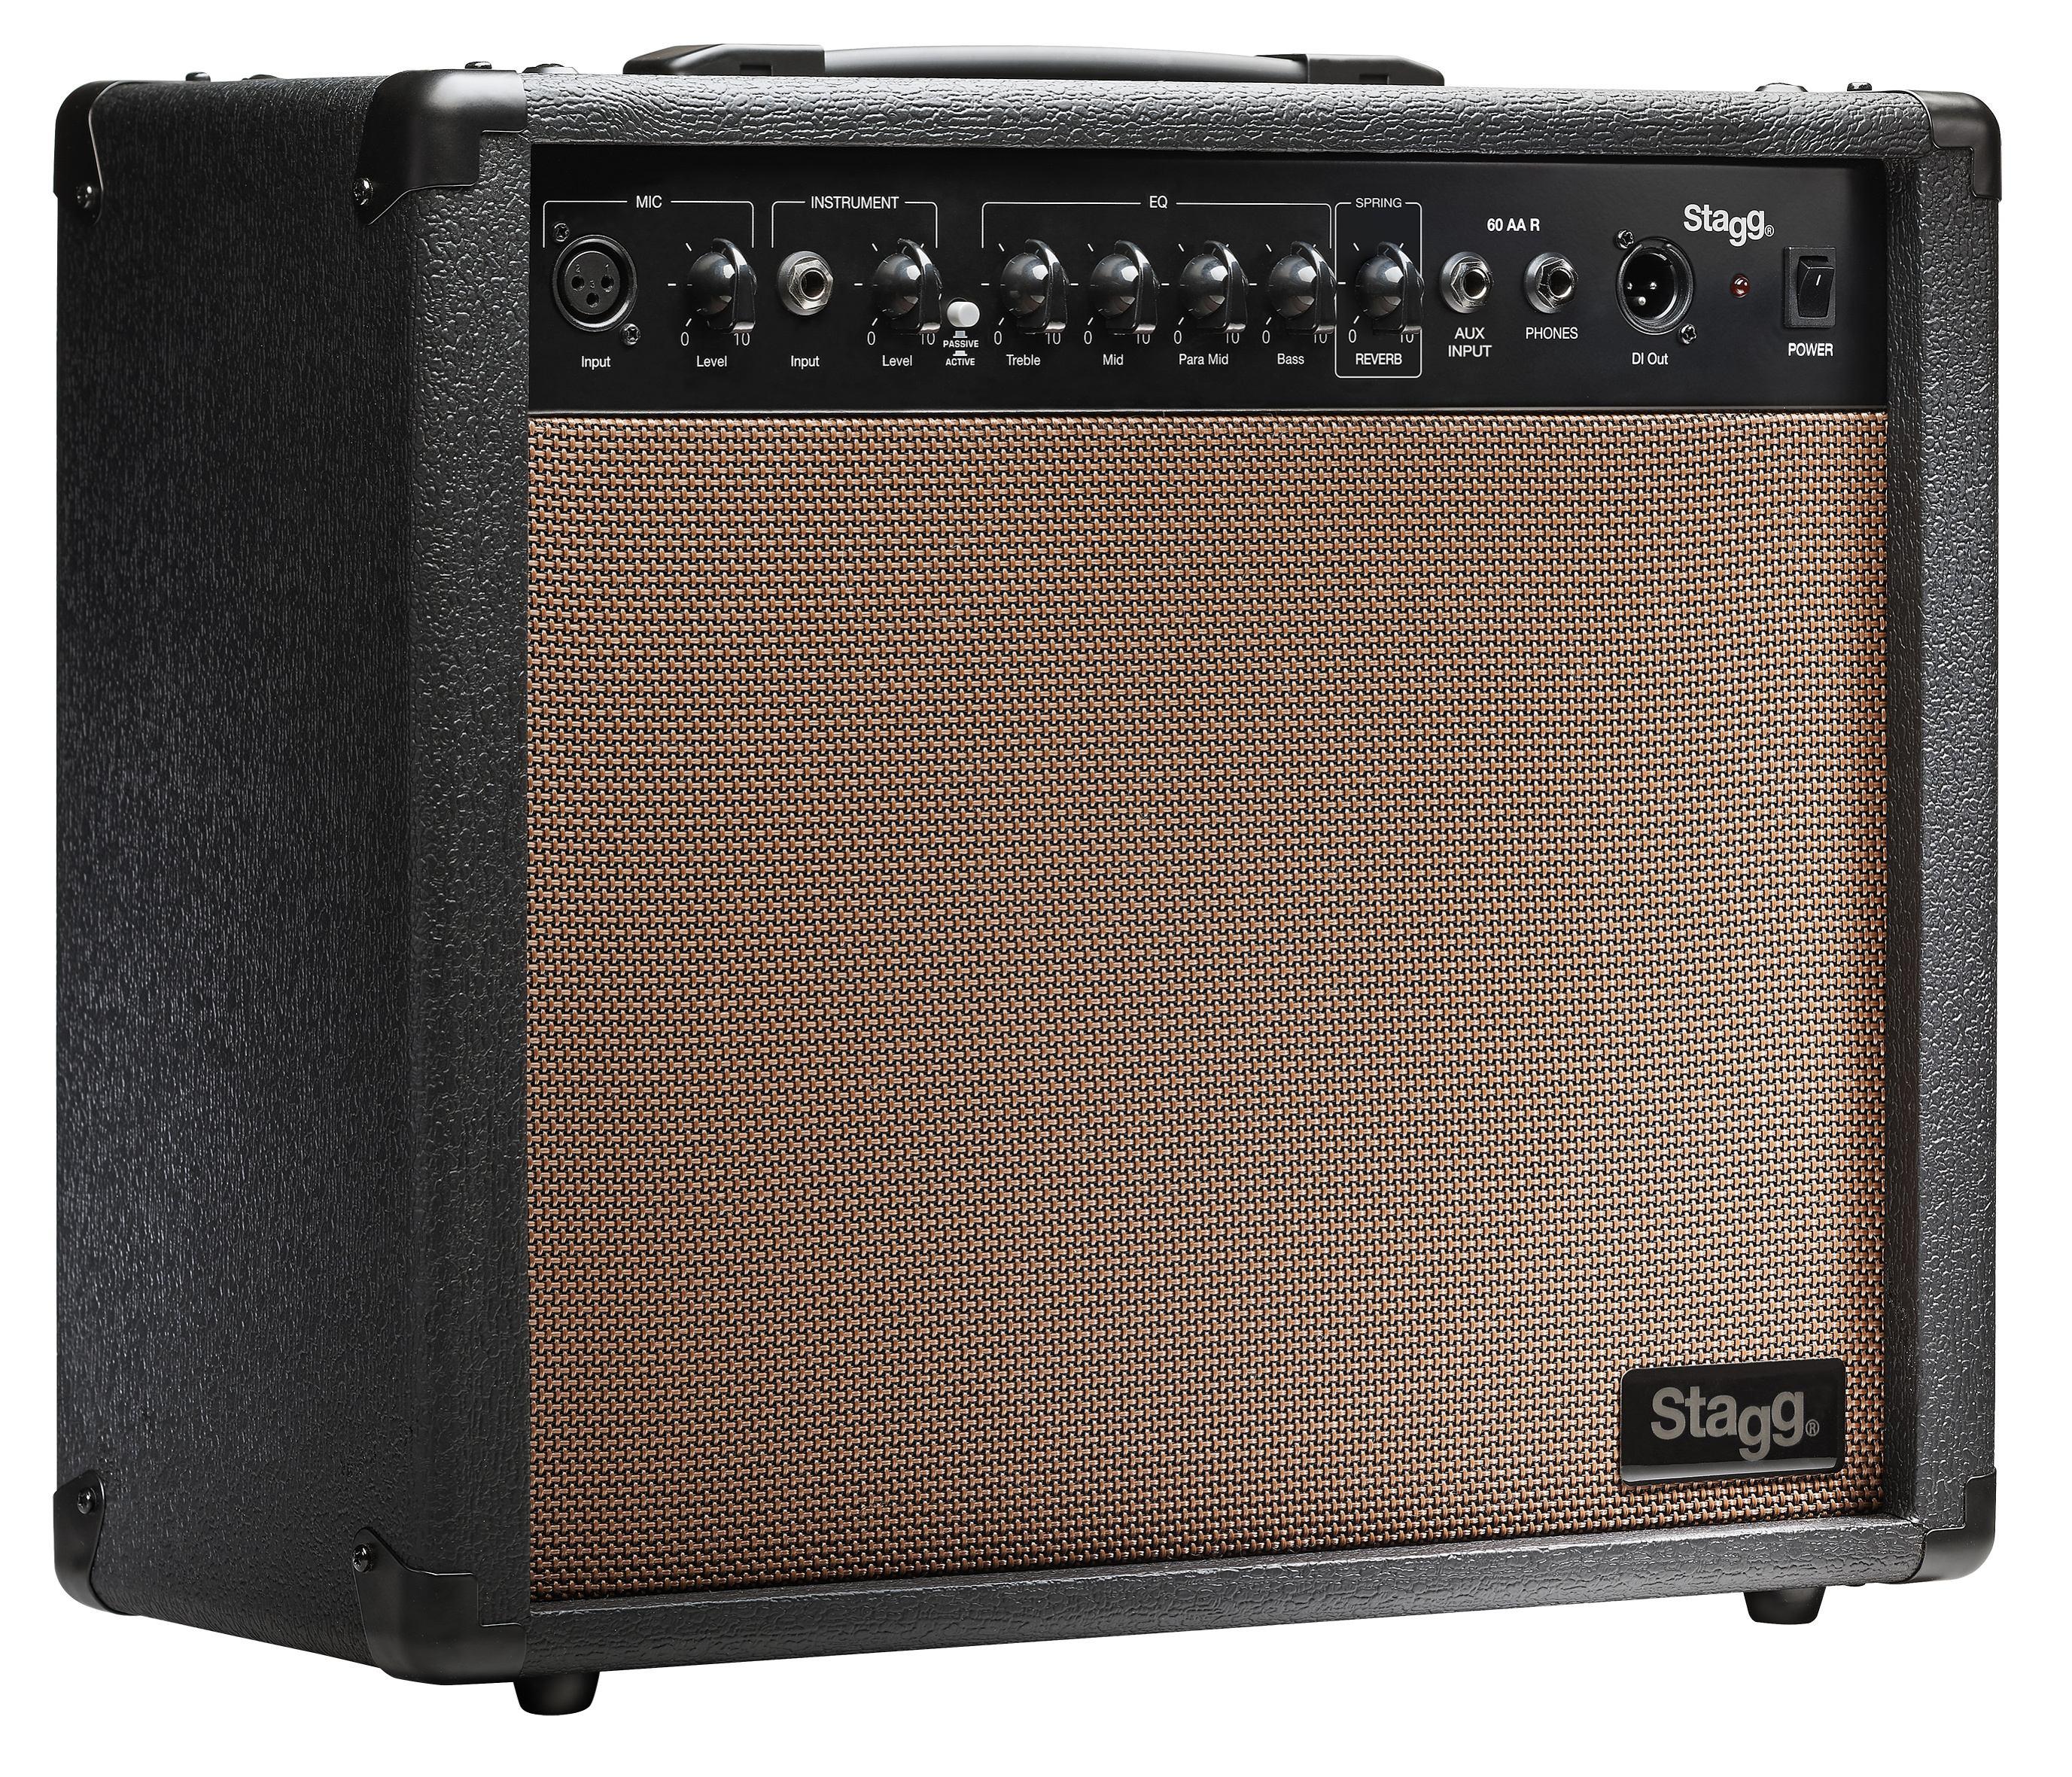 Stagg 60 AA R, kombo pro el. akustickou kytaru, 60W